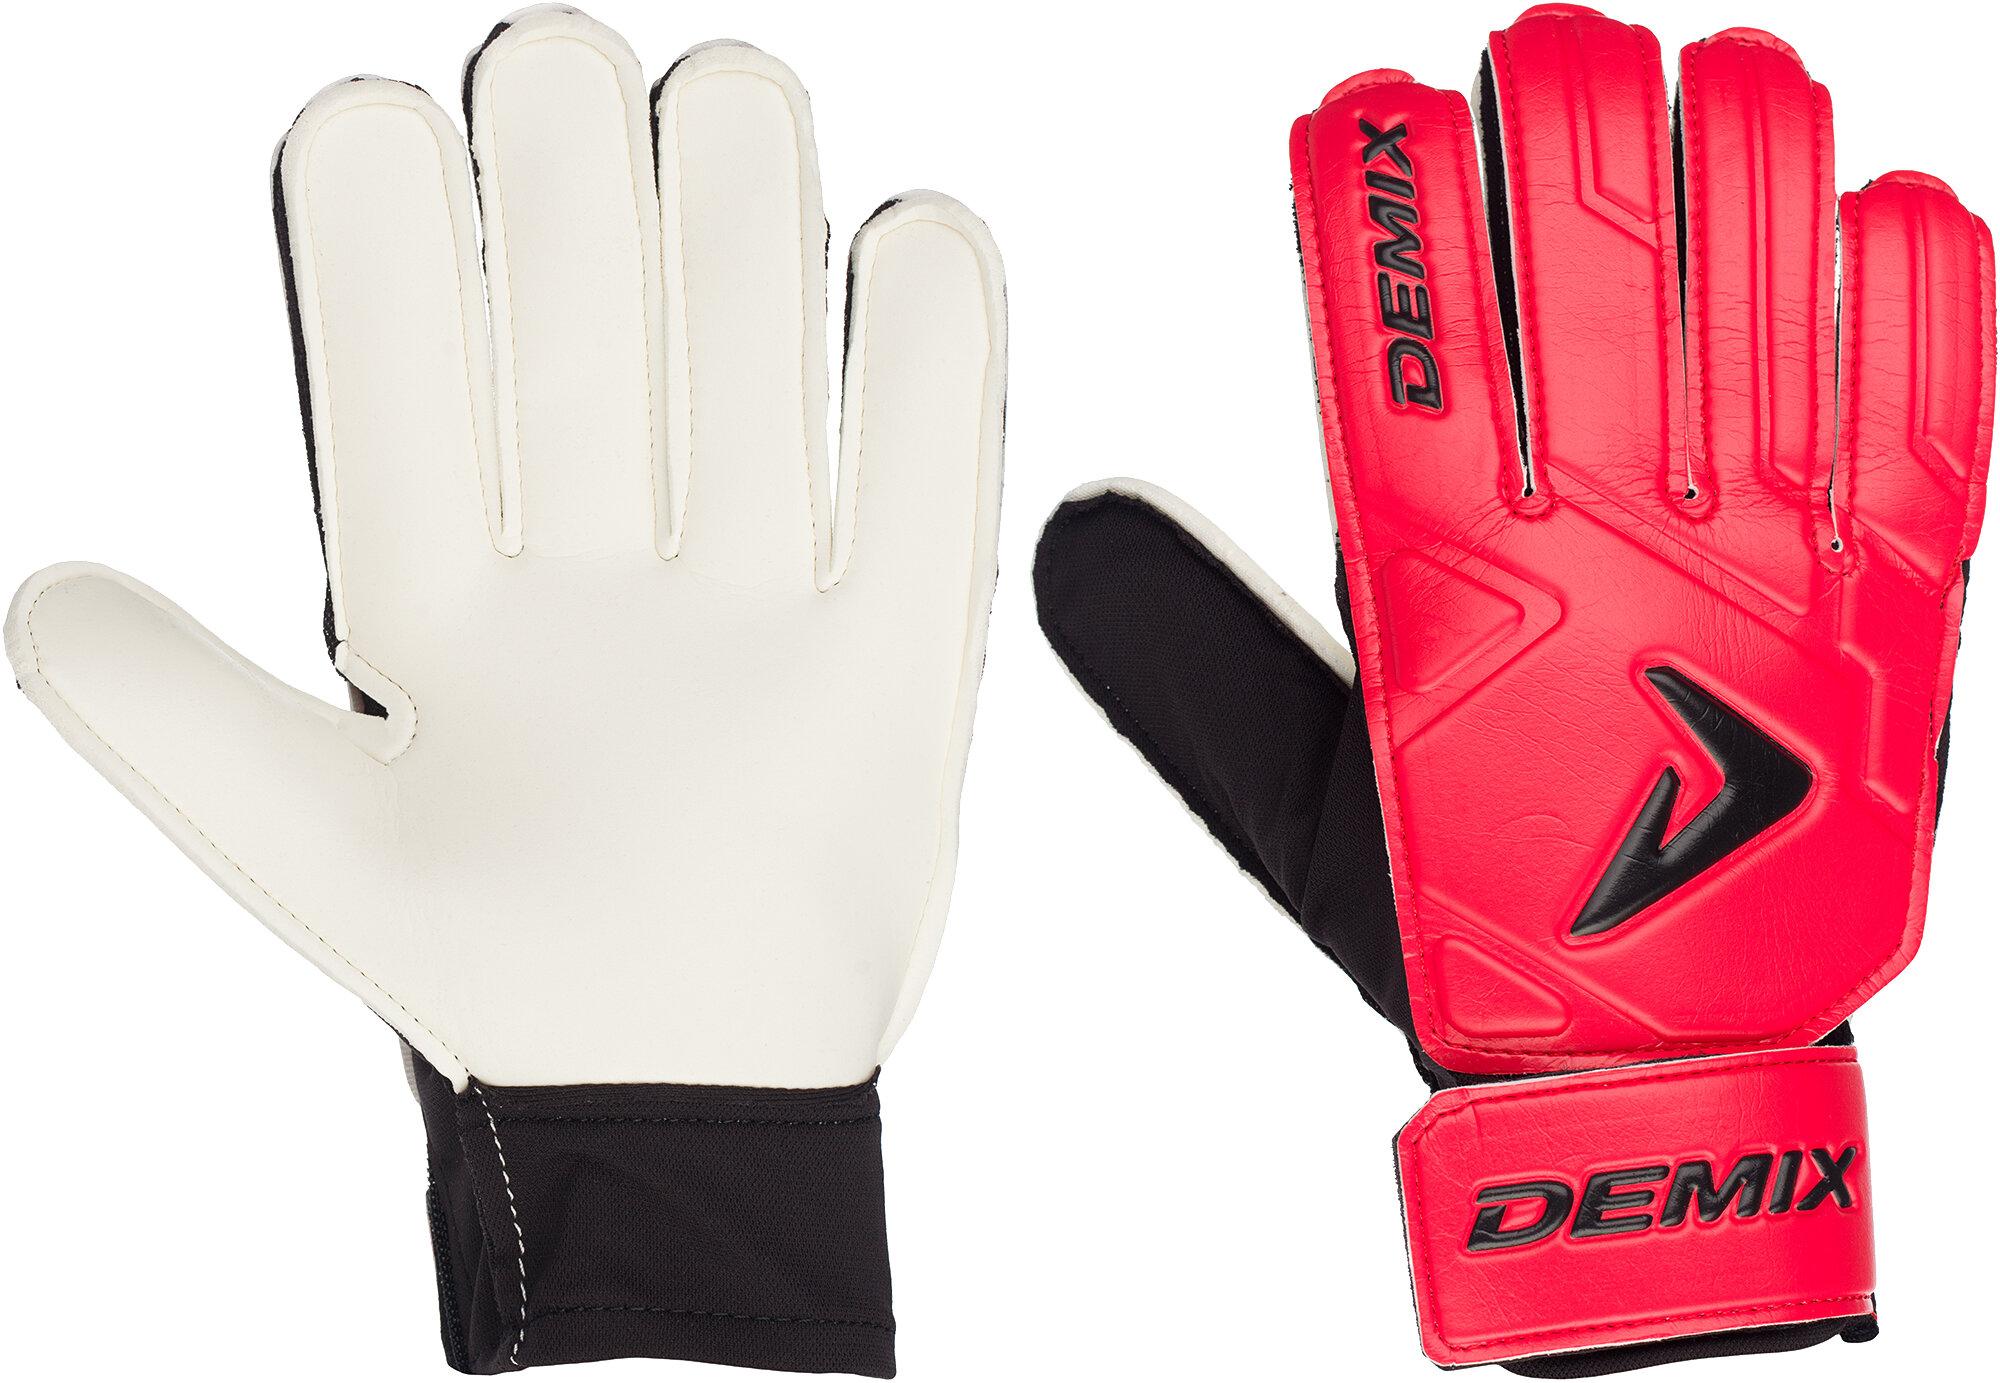 Demix Перчатки вратарские детские Demix, размер 7